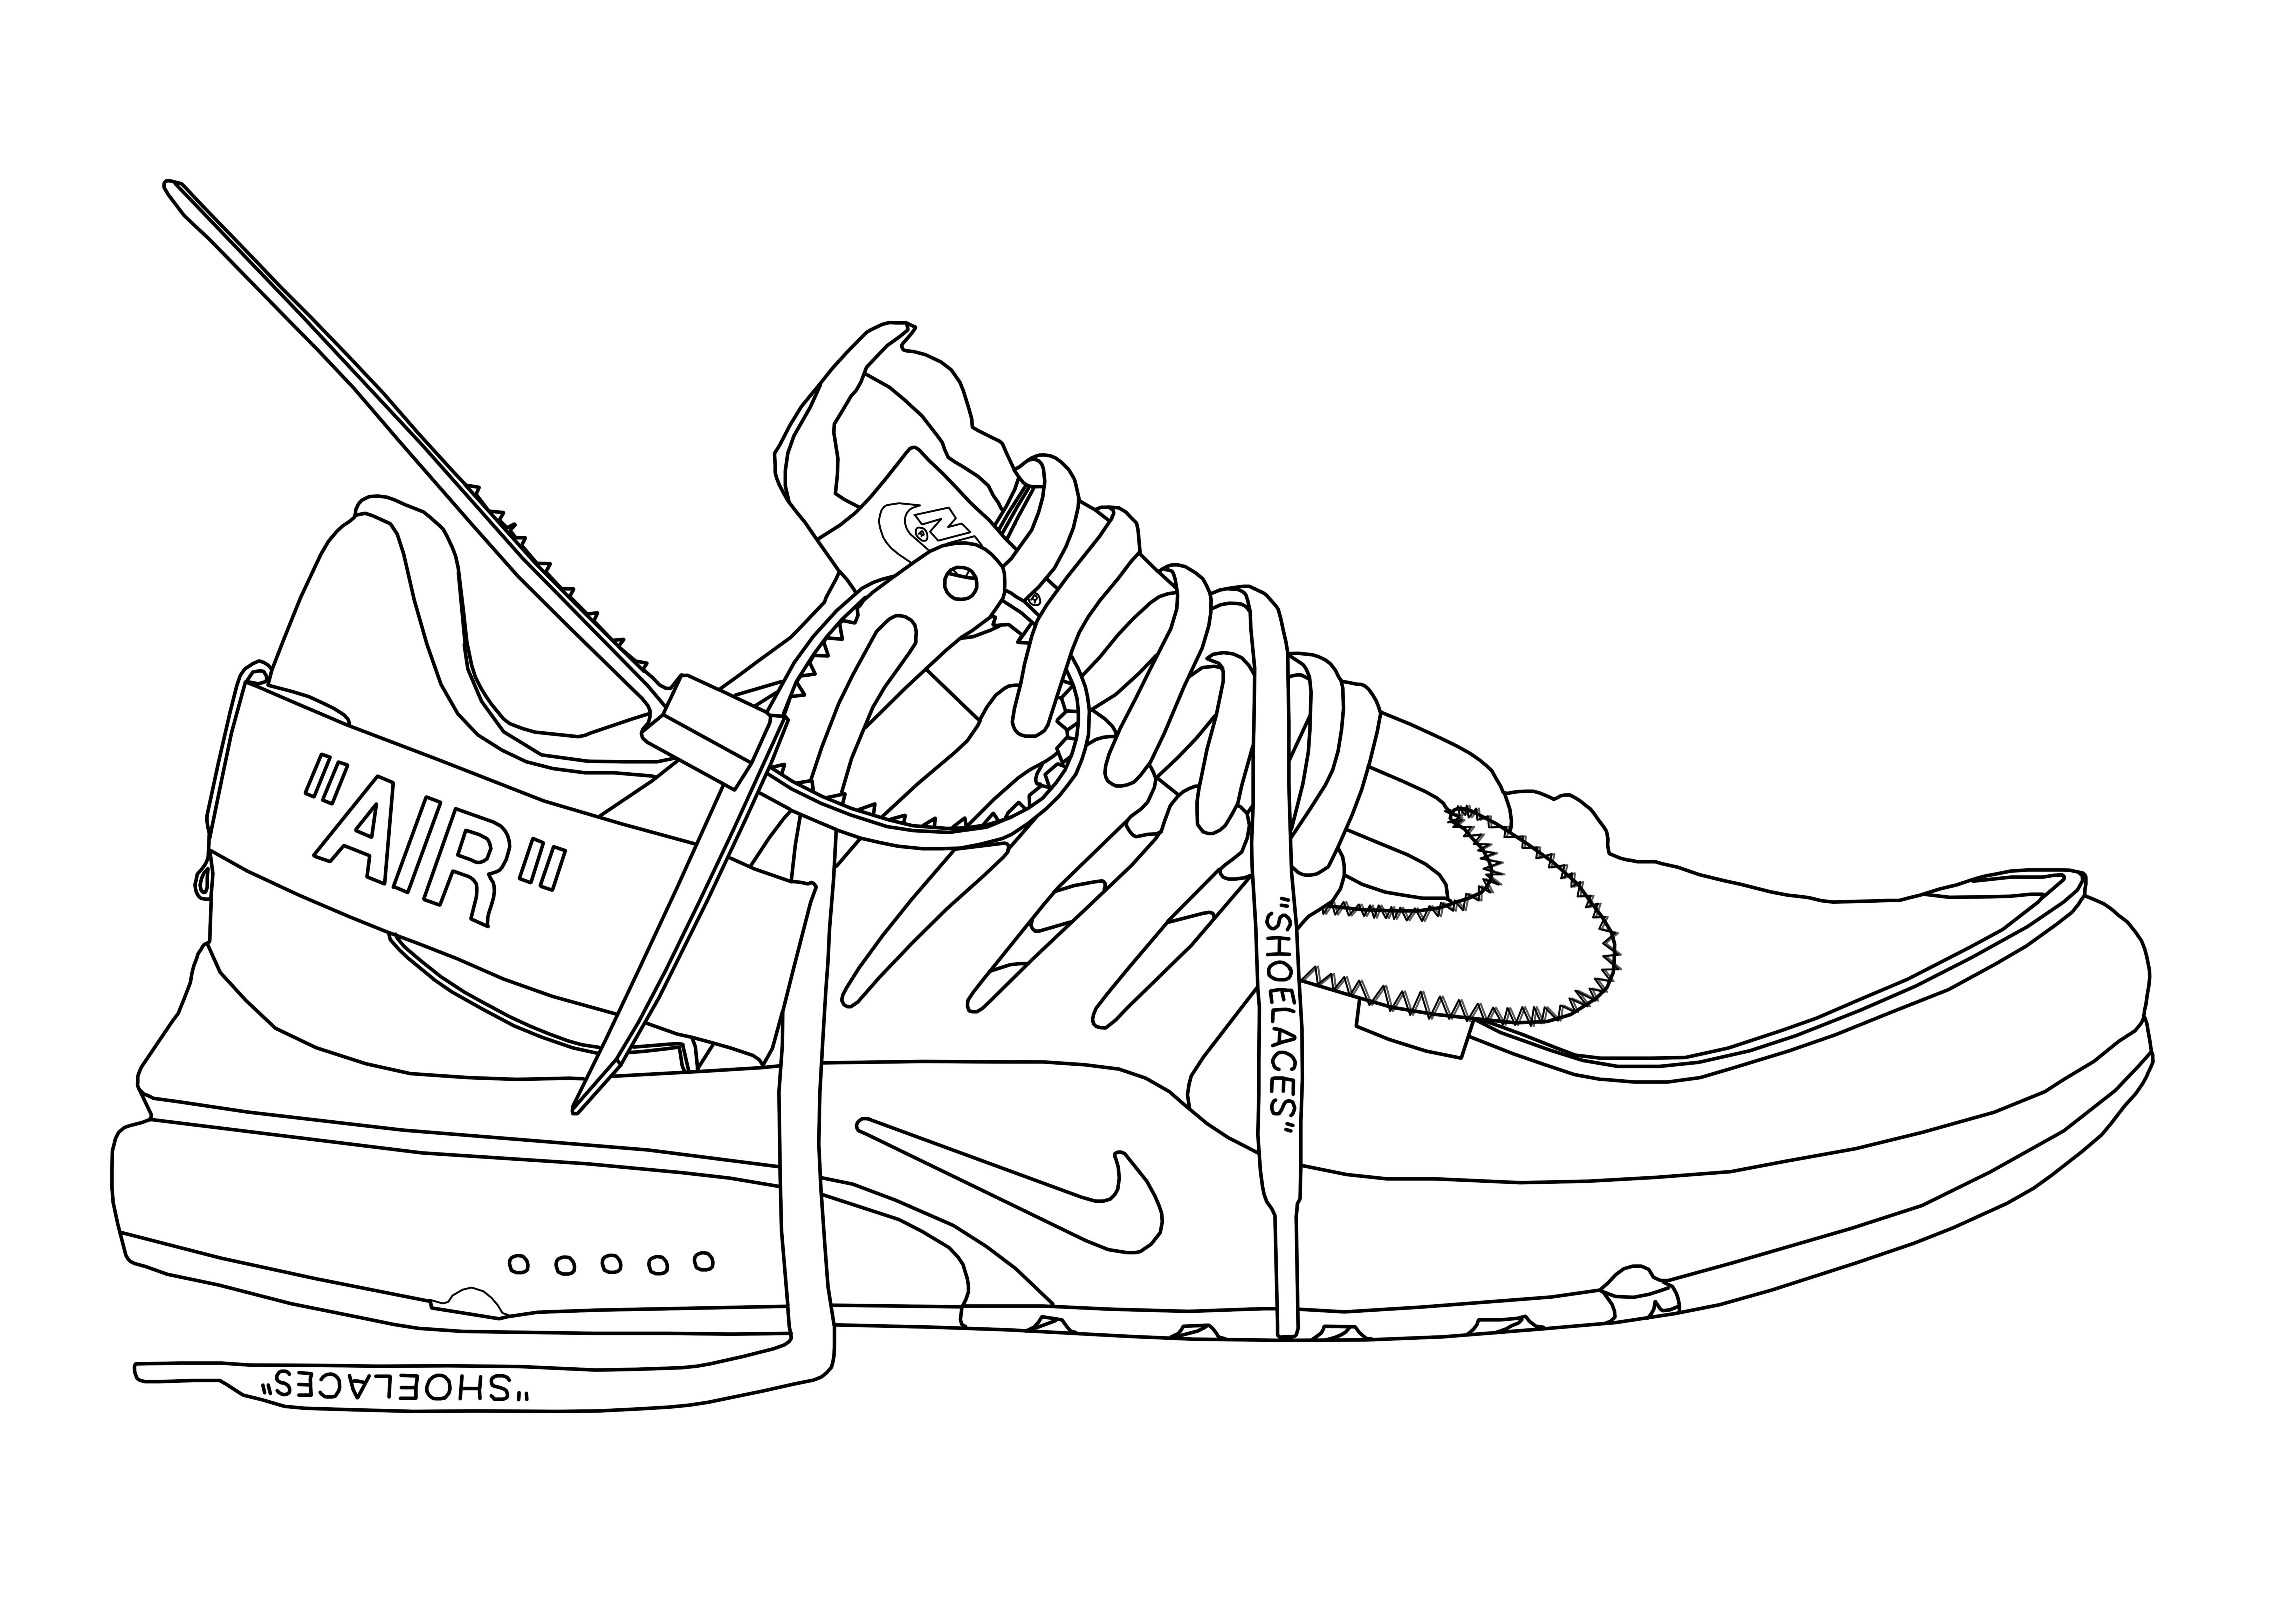 Off White Shoe Drawings Yahoo Zoekresultaten Van Afbeeldingen Off White Shoes Shoes Drawing Sneakers Drawing